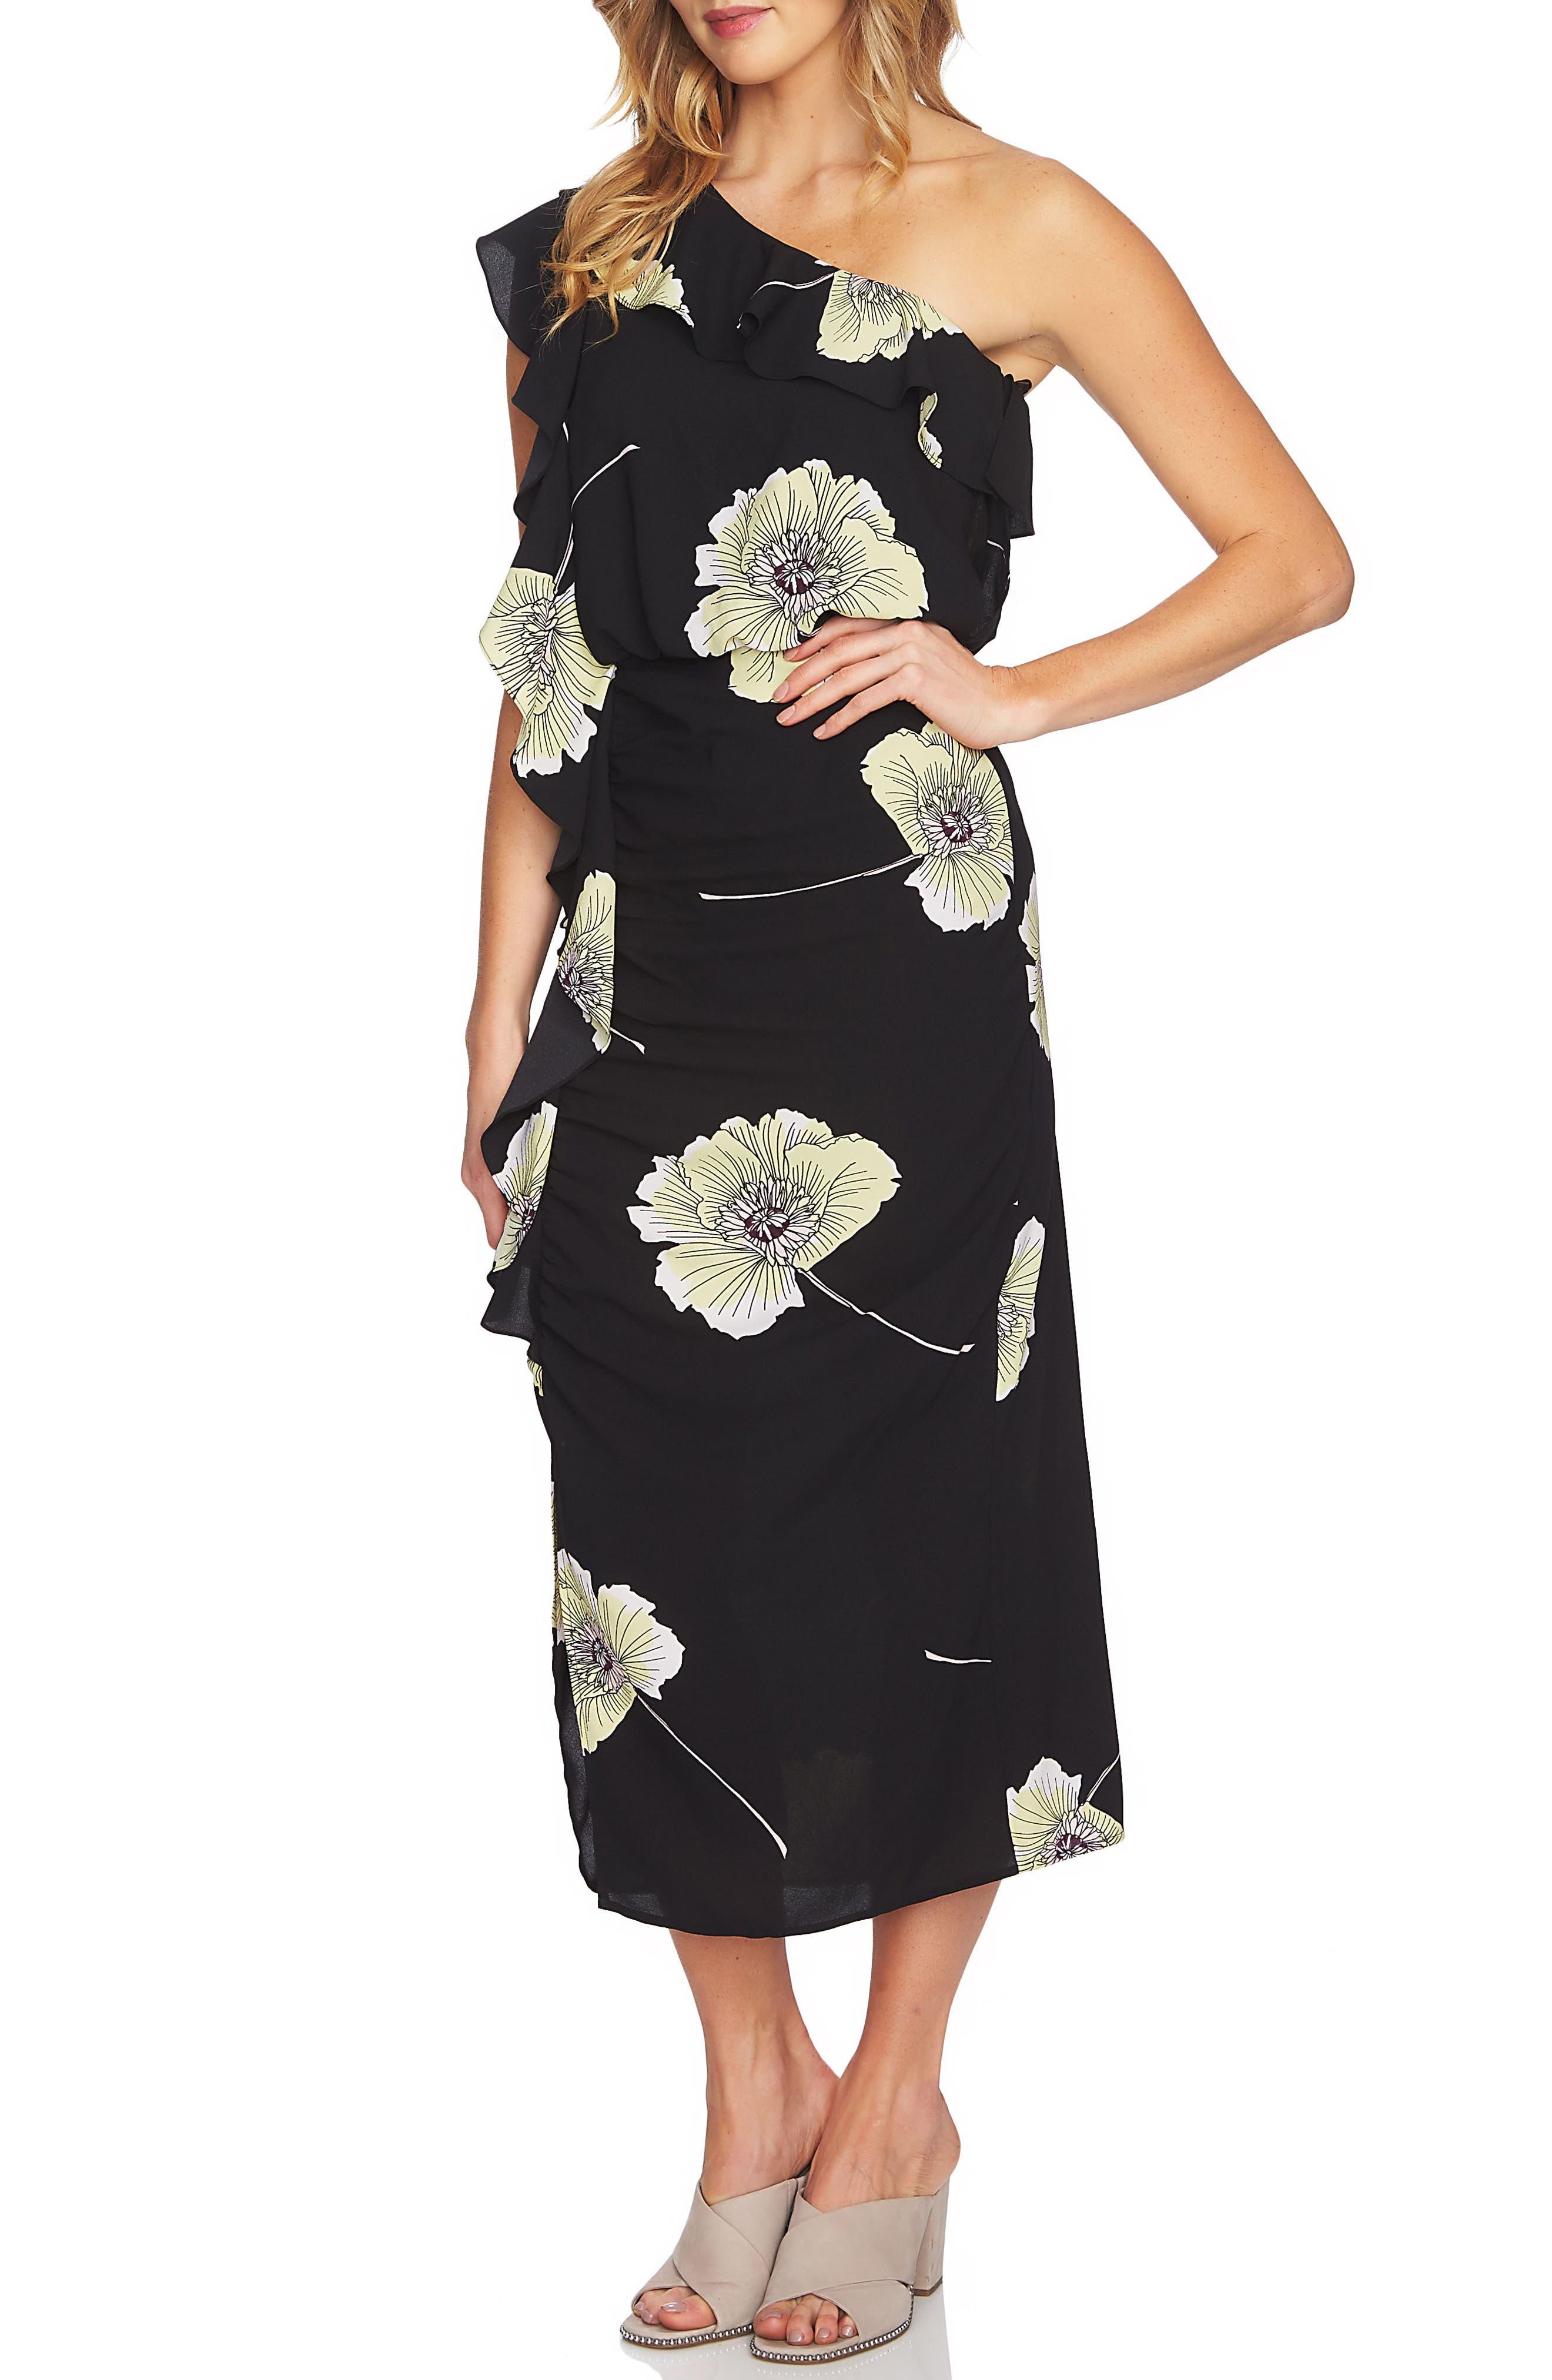 Main Image - 1.STATE Ruffle One-Shoulder Midi Dress